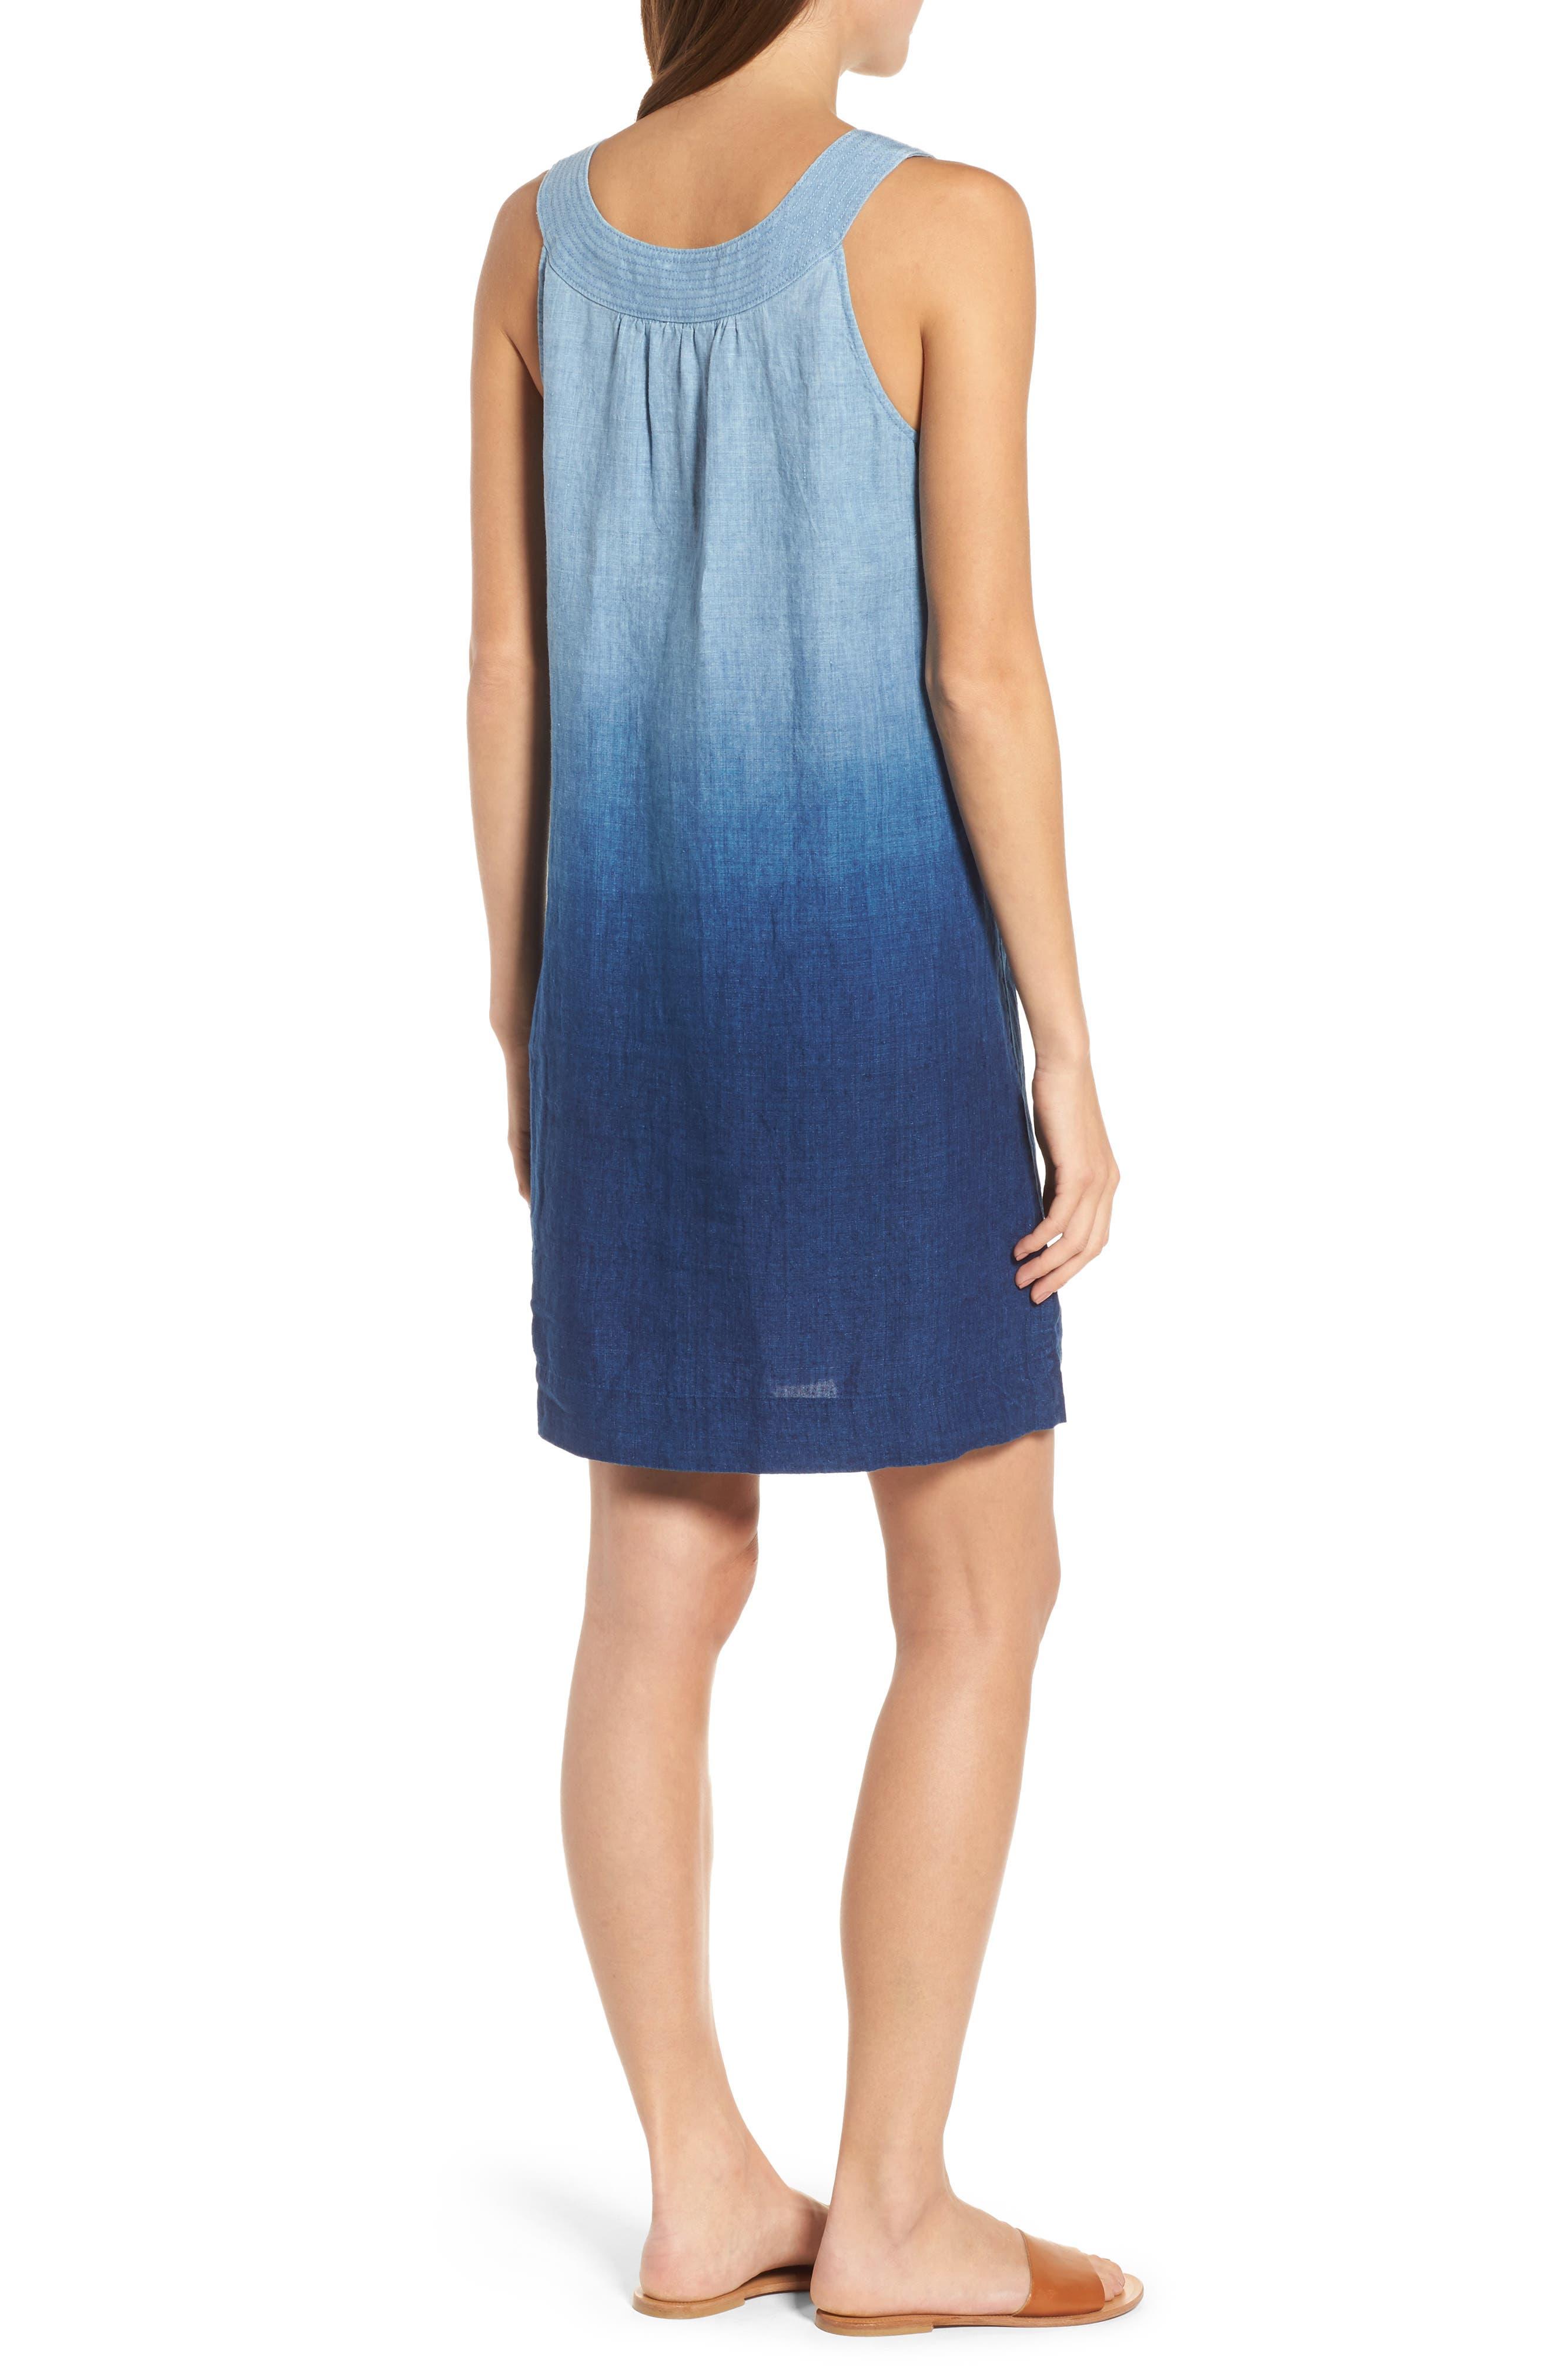 Indigo Dip Dyed Shift Dress,                             Alternate thumbnail 2, color,                             Dark Indigo Wash